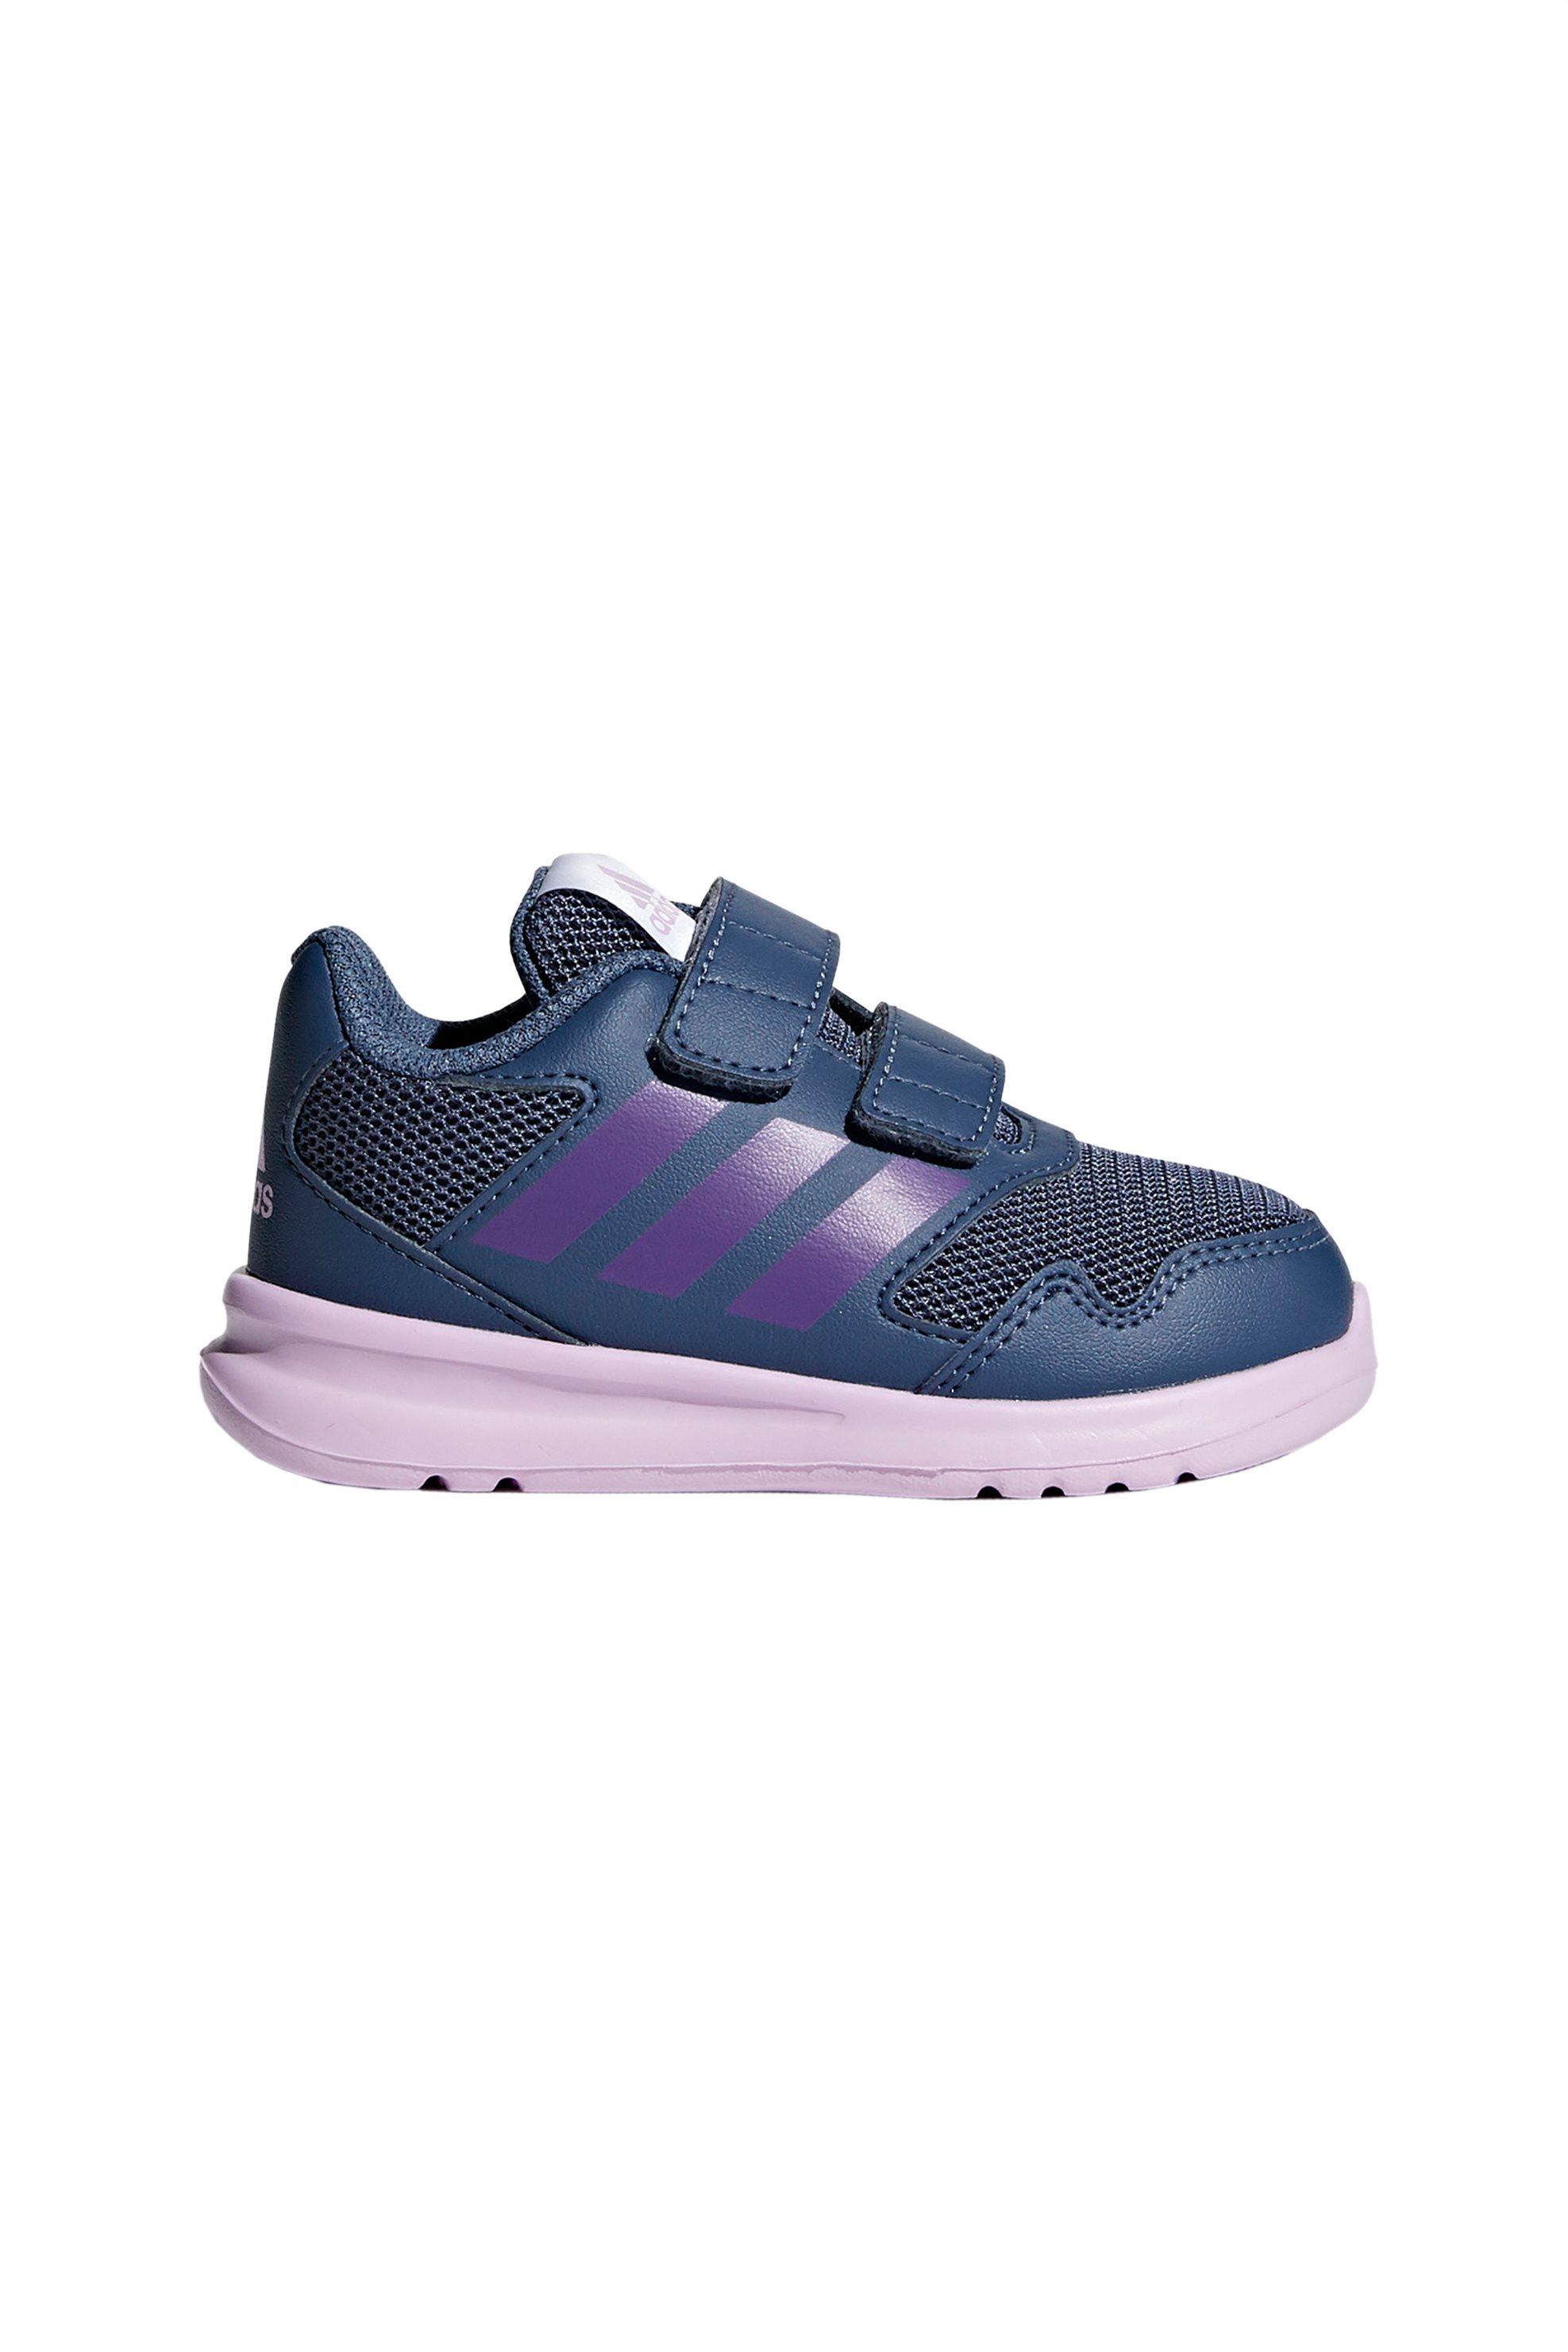 Notos Adidas παιδικά αθλητικά παπούτσια AltaRun μπλε  μoβ  ροζ - AH2412 -  Μπλε Σκούρο ae678a431fb